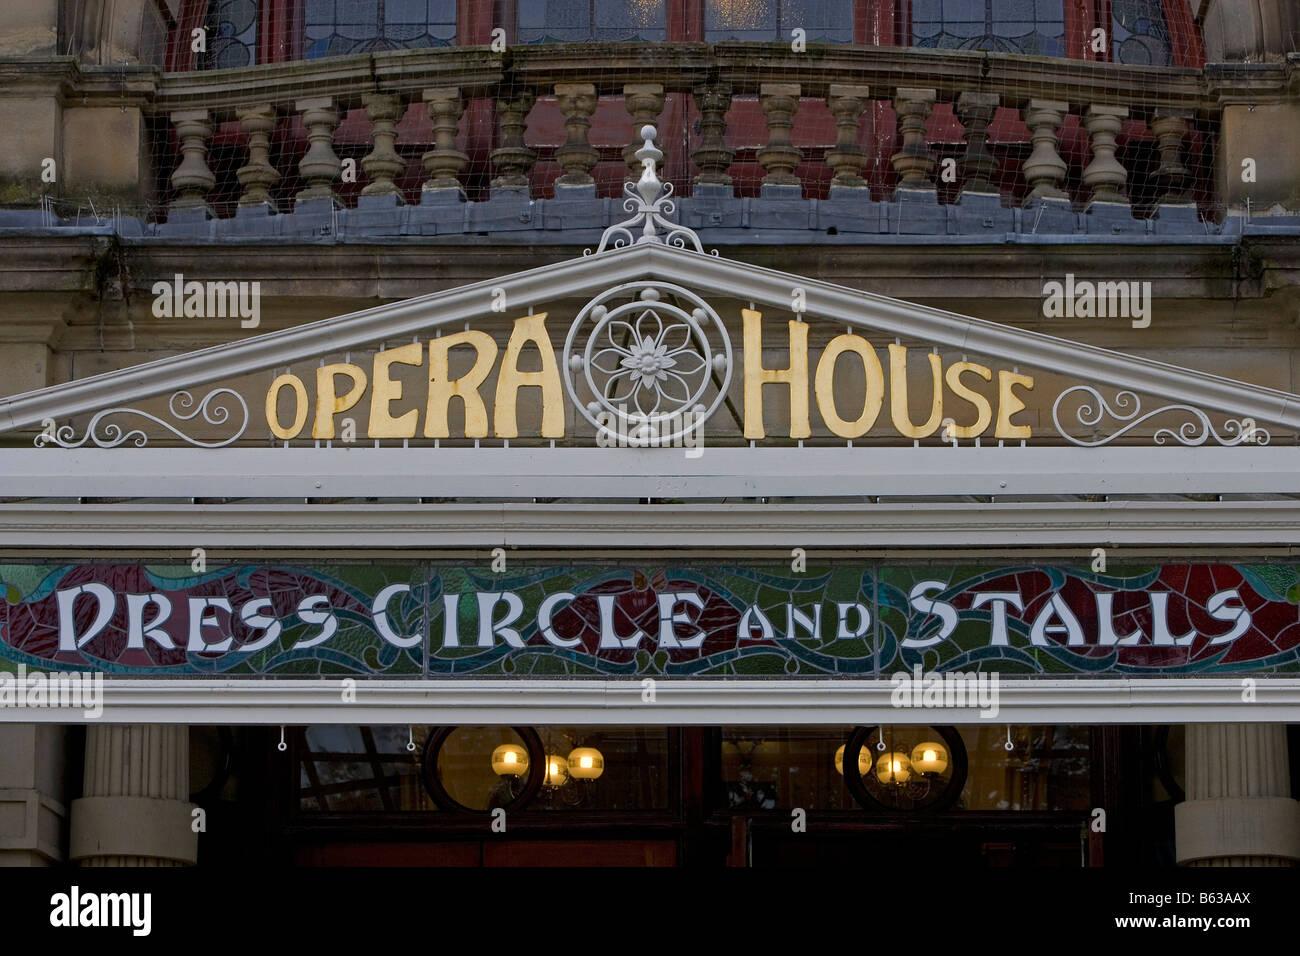 Buxton Opera House 1903 by Frank Matcham Derbyshire the Midlands UK United Kingdom Great Britain - Stock Image